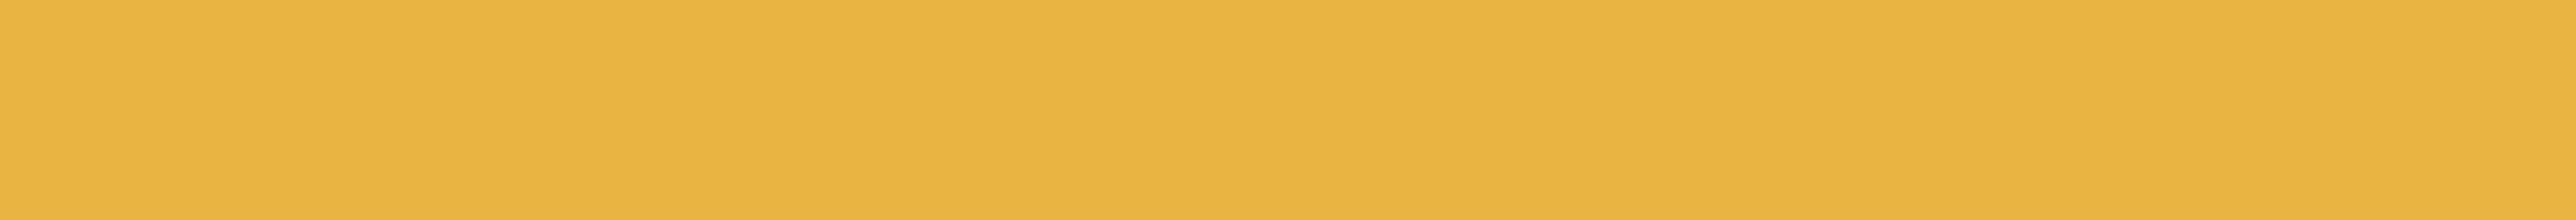 yellowangle